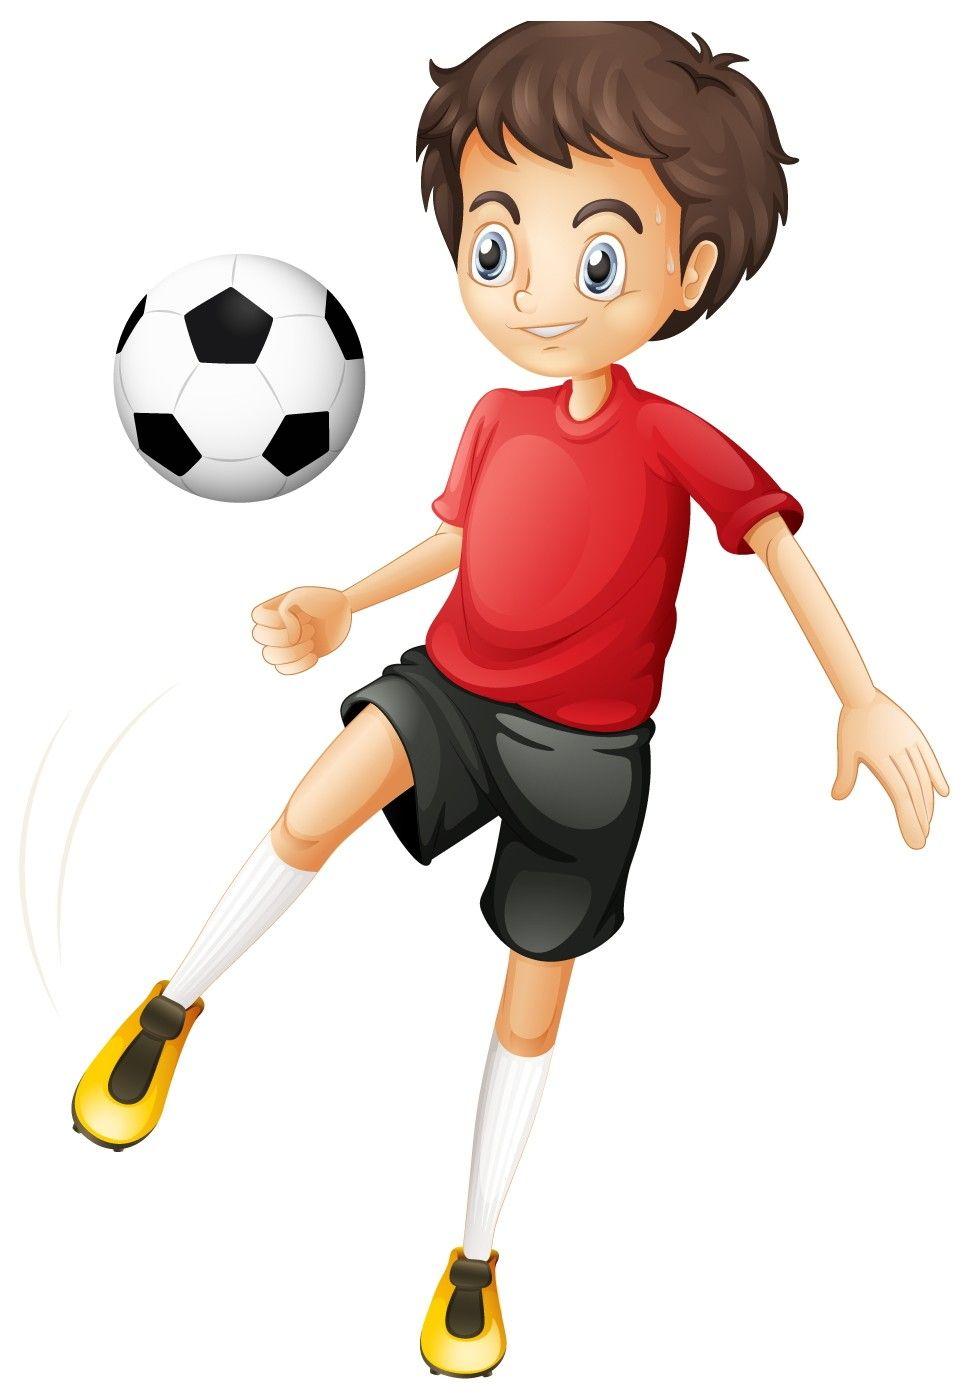 Kid Football Player Cartoon Image H.